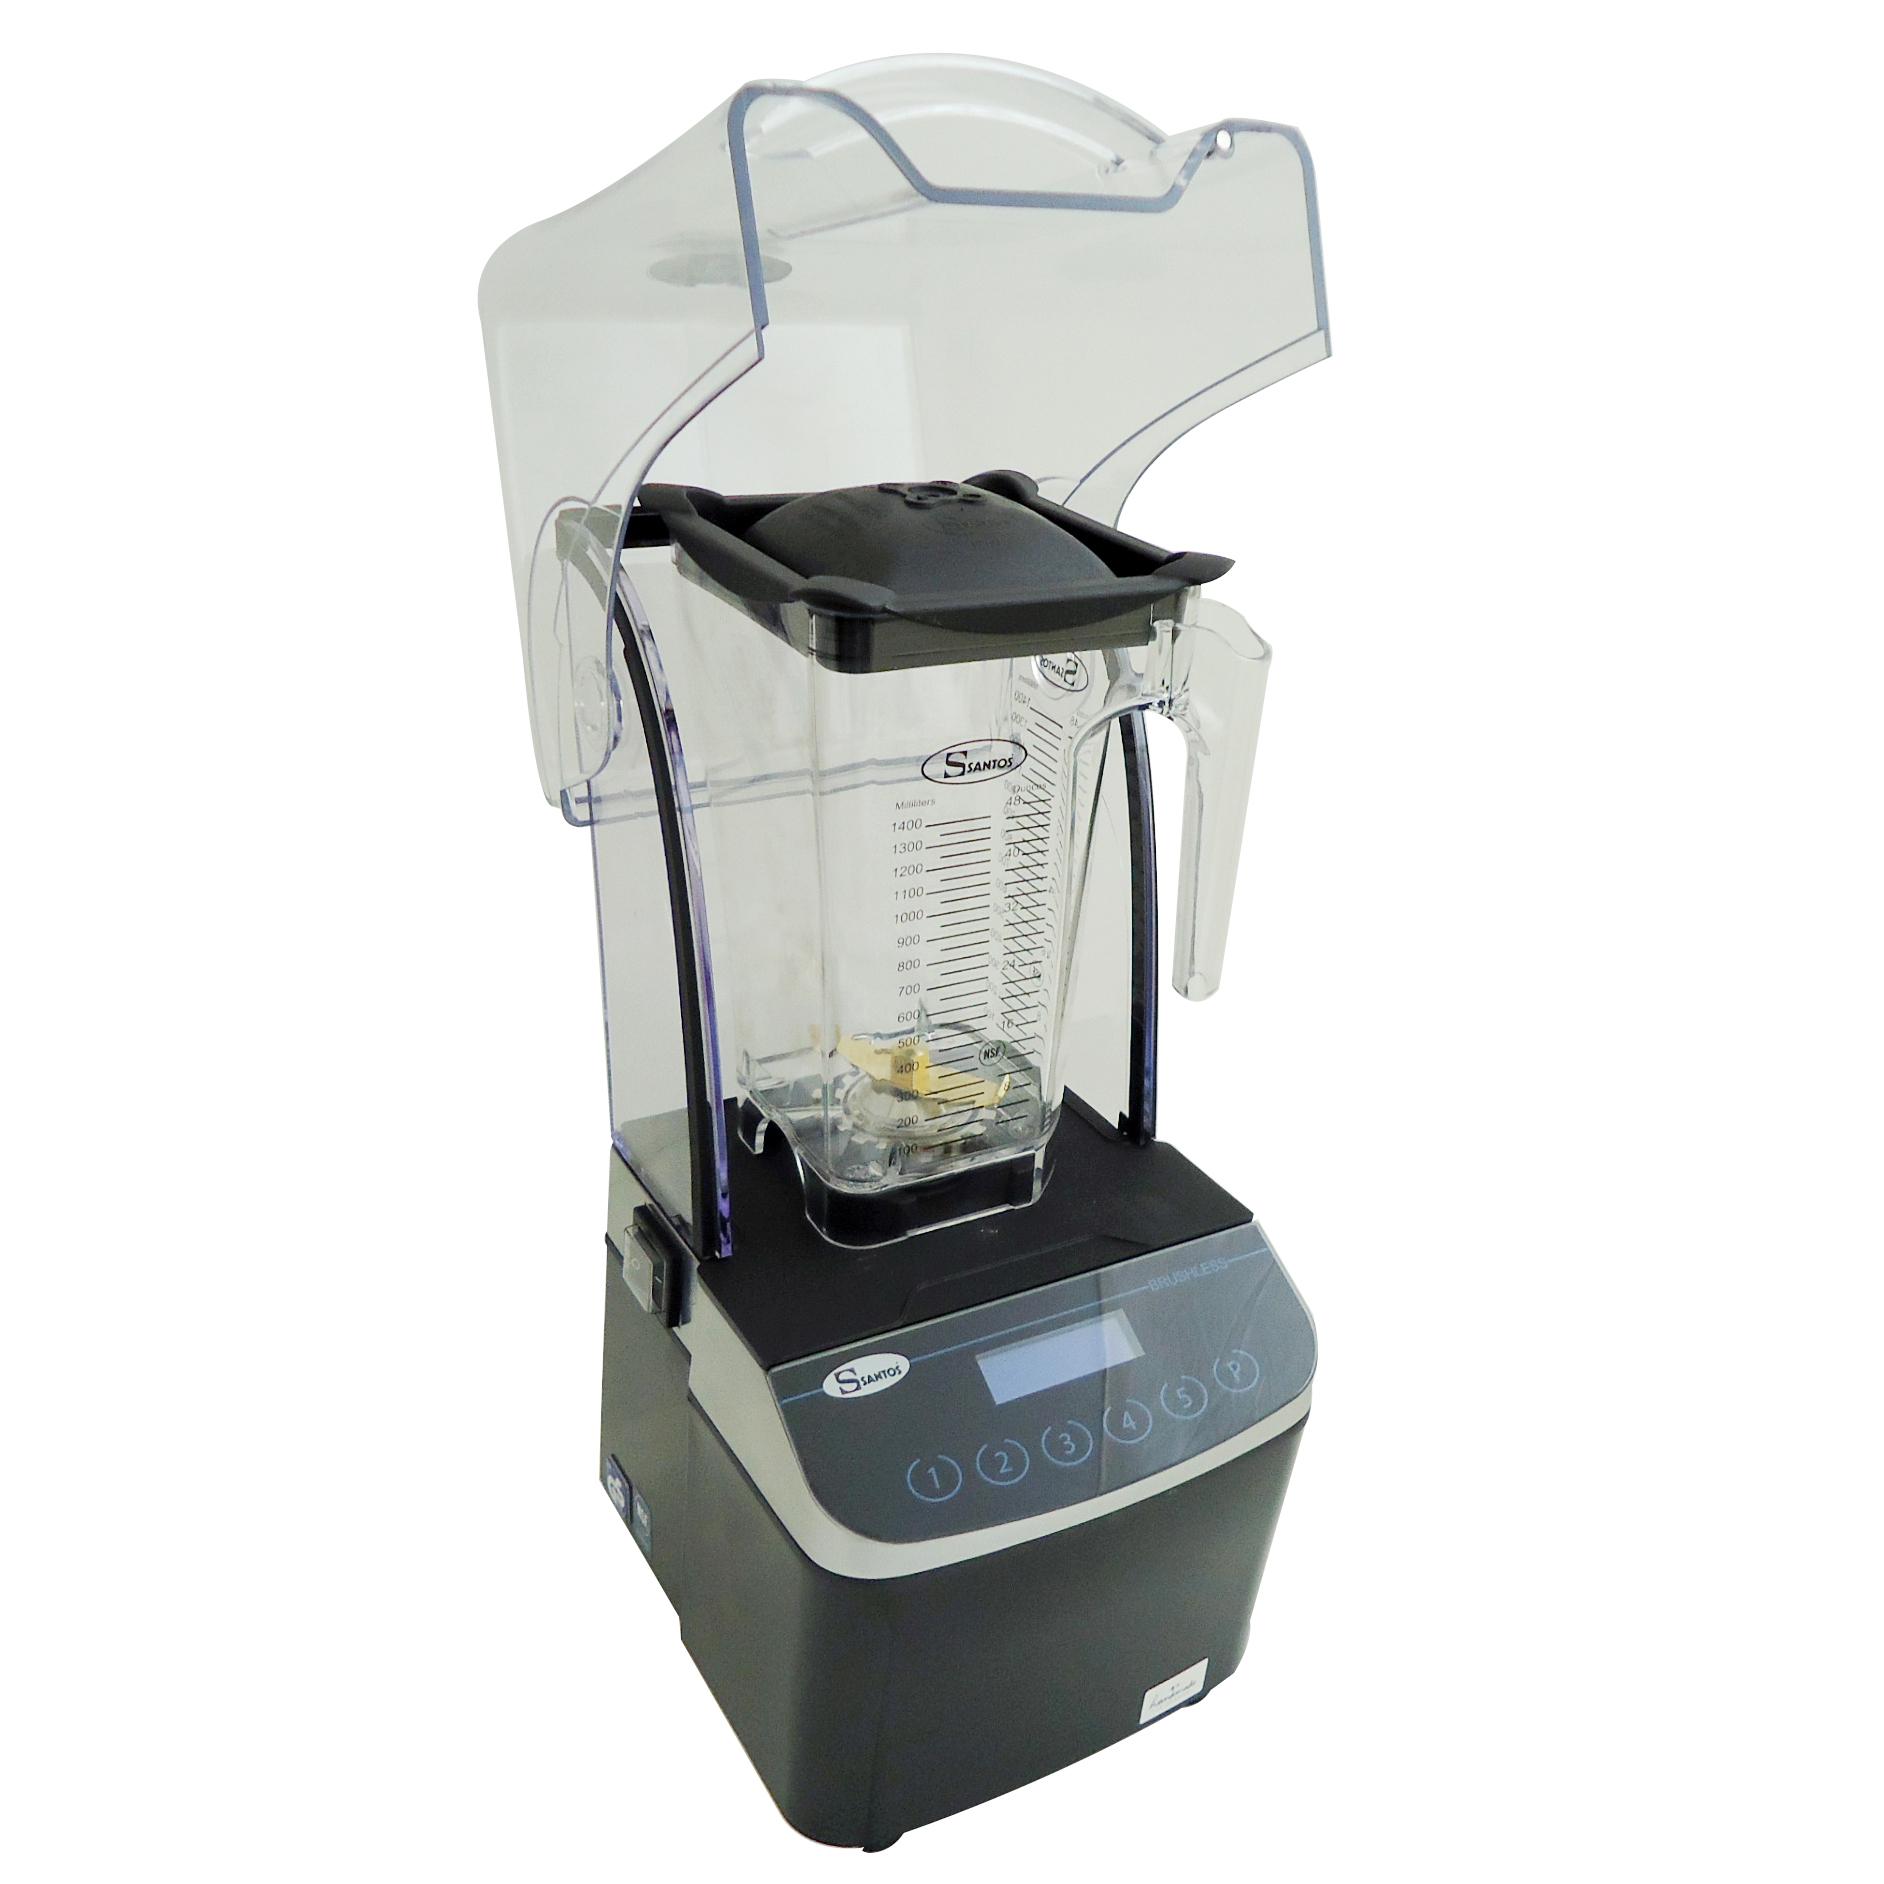 Santos No62 Brushless Blender Αθόρυβο Μπλέντερ Ηλεκτρικό 3.000 Watt - Χωρητικότη επαγγελματικός εξοπλισμός   μηχανές καφέ   συσκευές για bar   μπλέντερ   santos